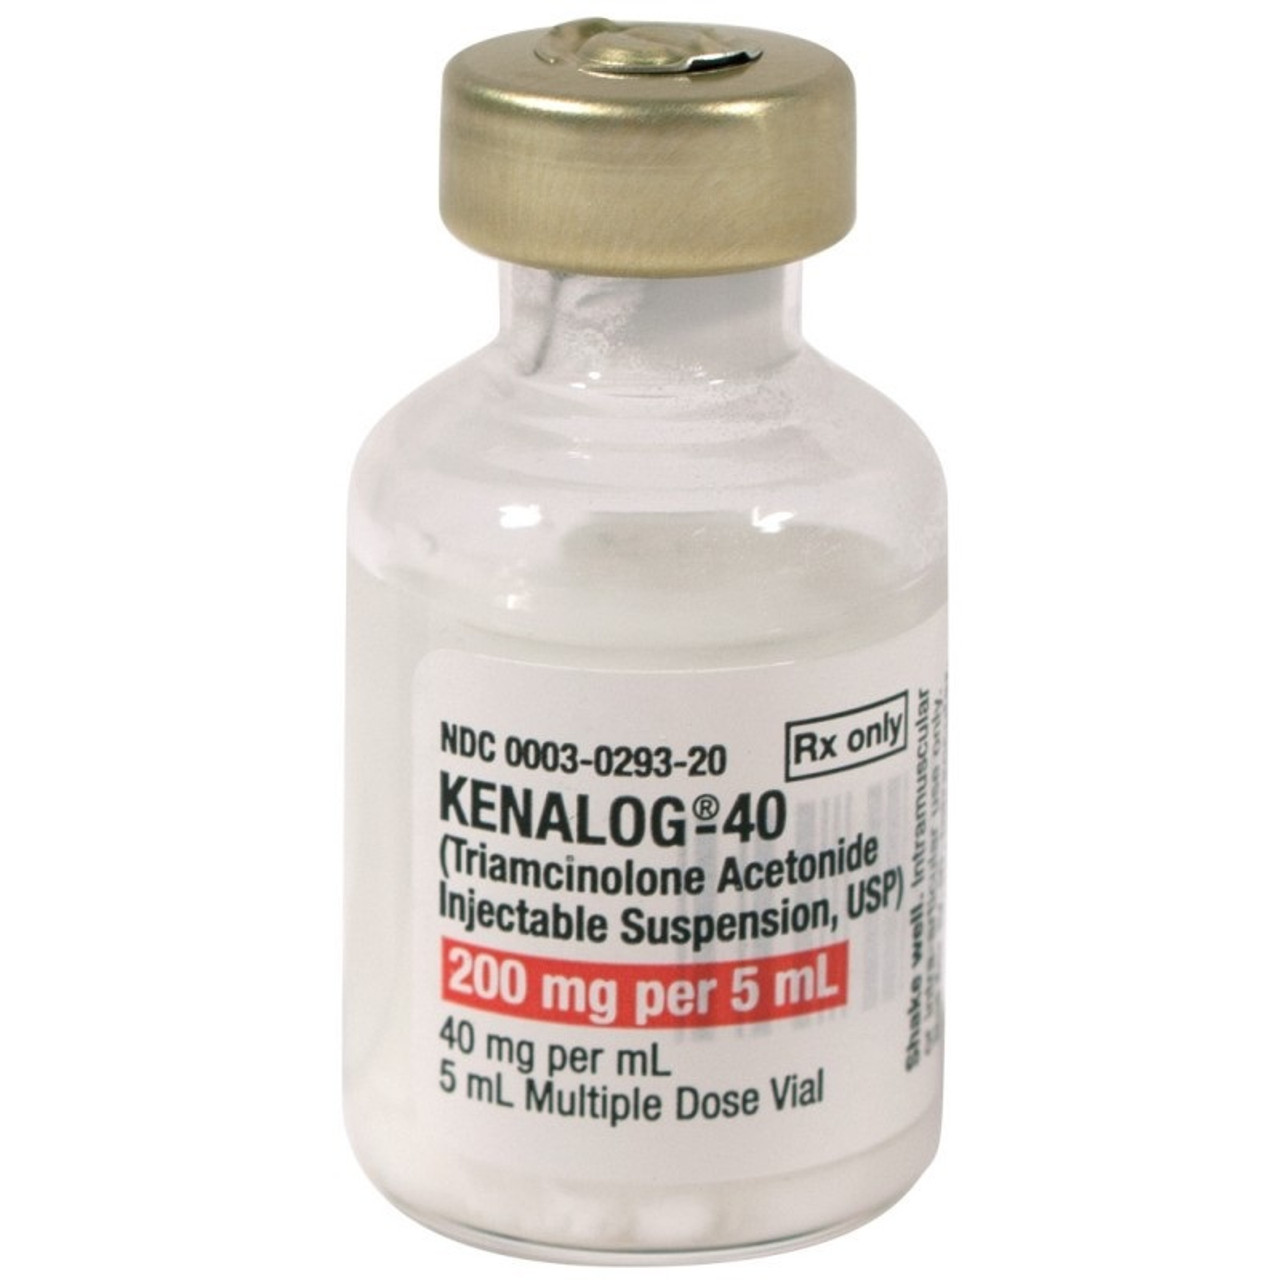 Bristol-Myers Squibb 40mg/mL Kenalog-40 Injection in 5mL MDV